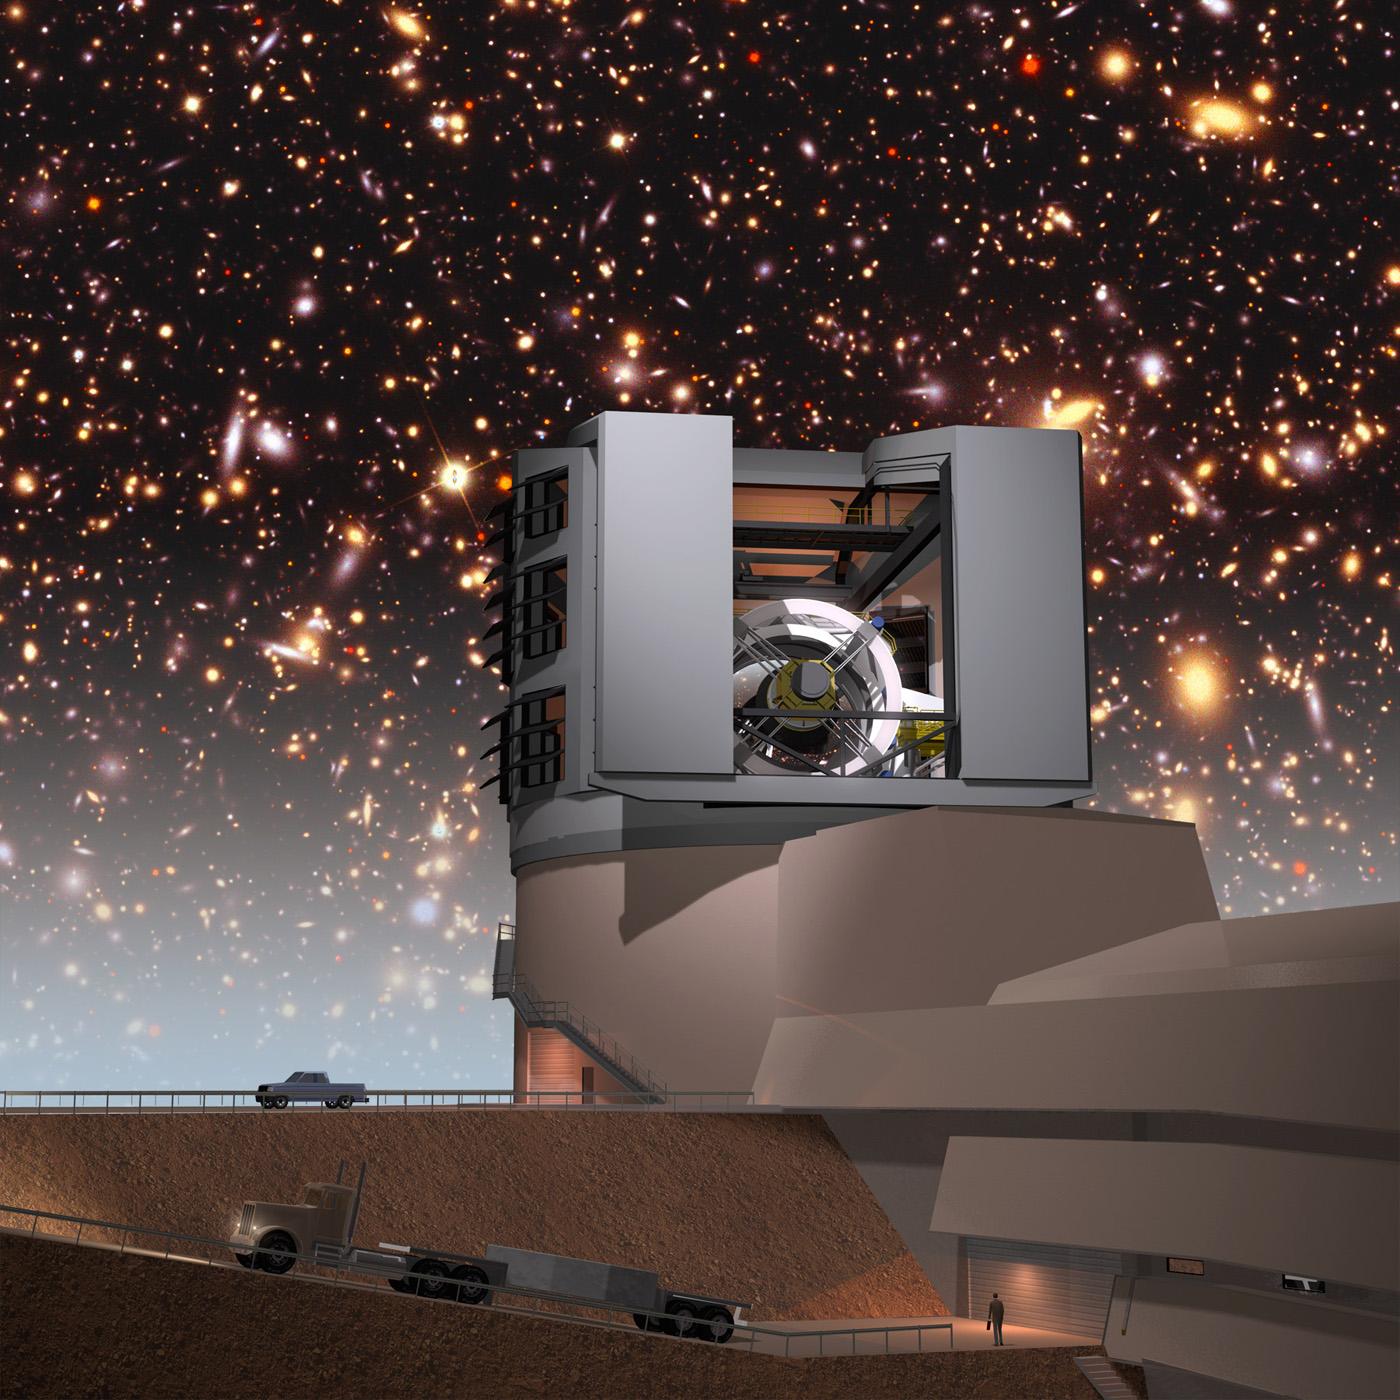 Observatory set against a night sky